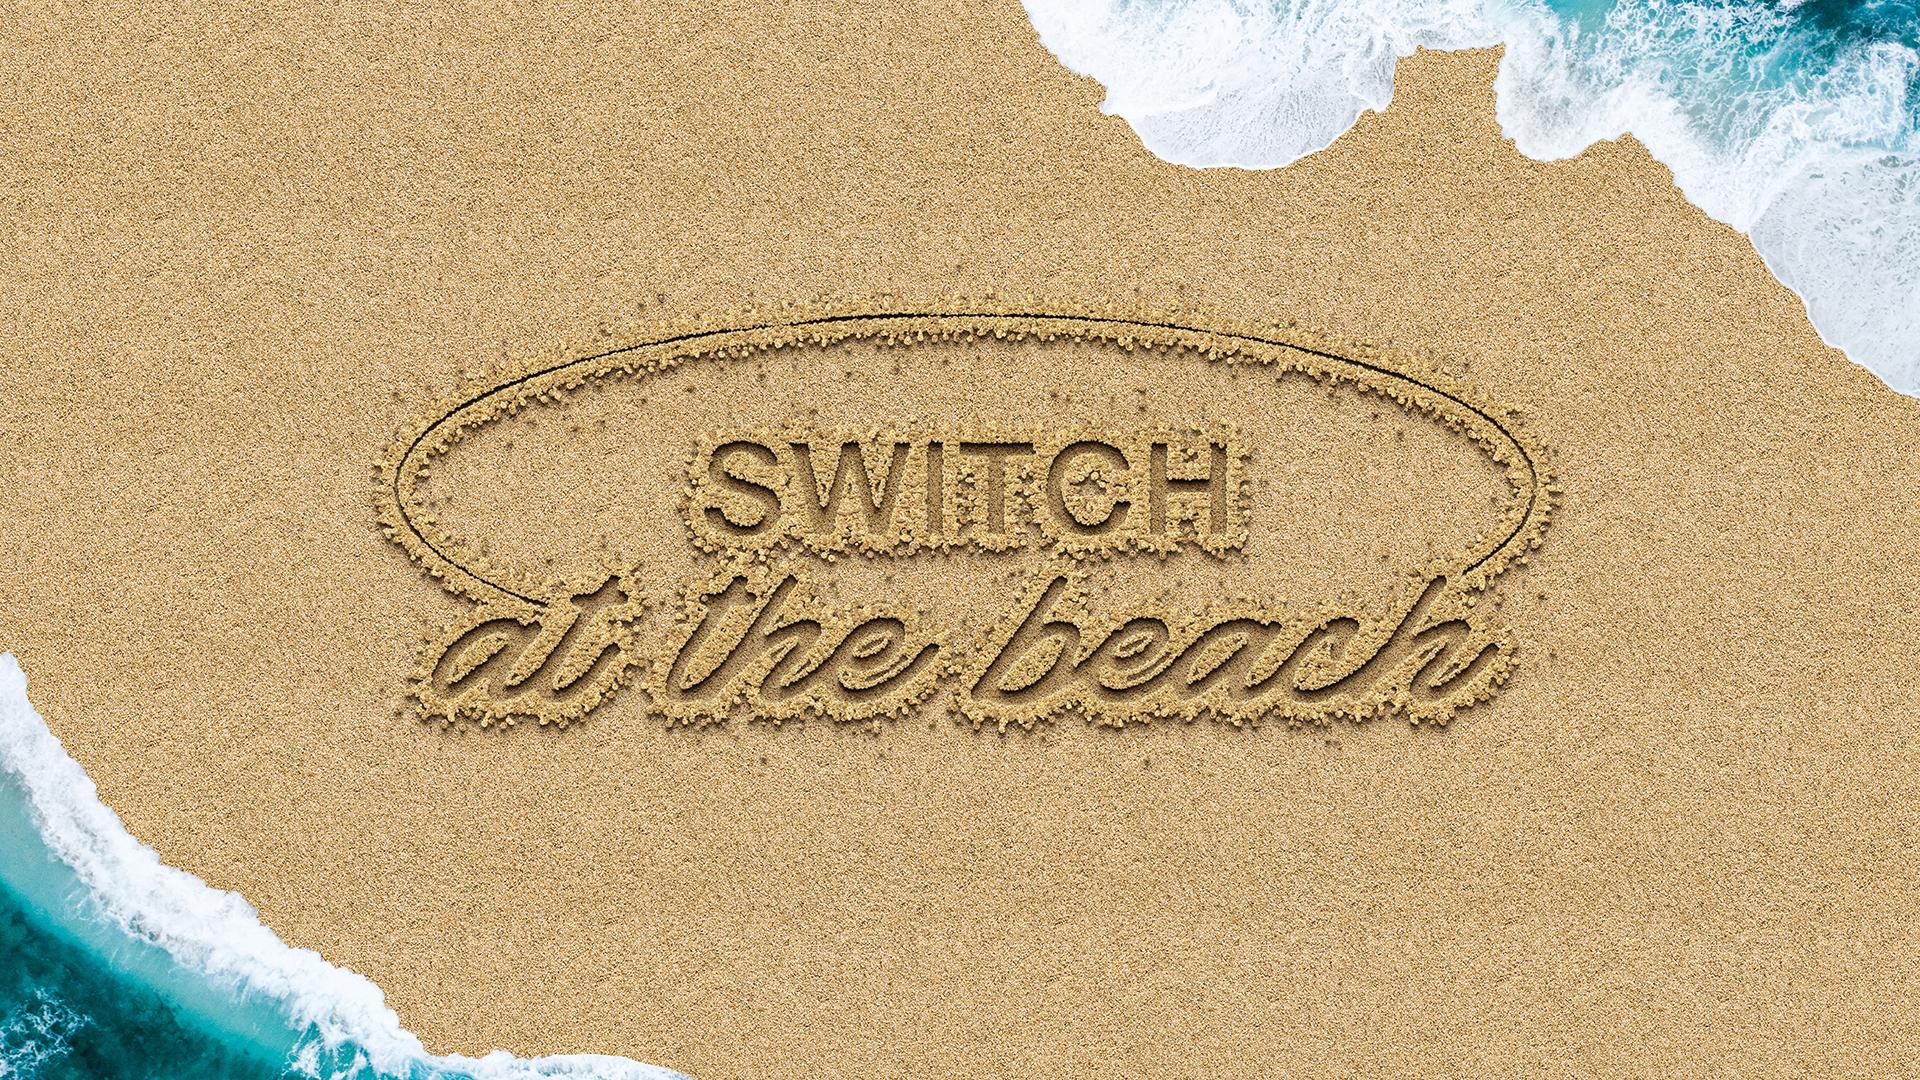 Switch at the Beach (JPG)